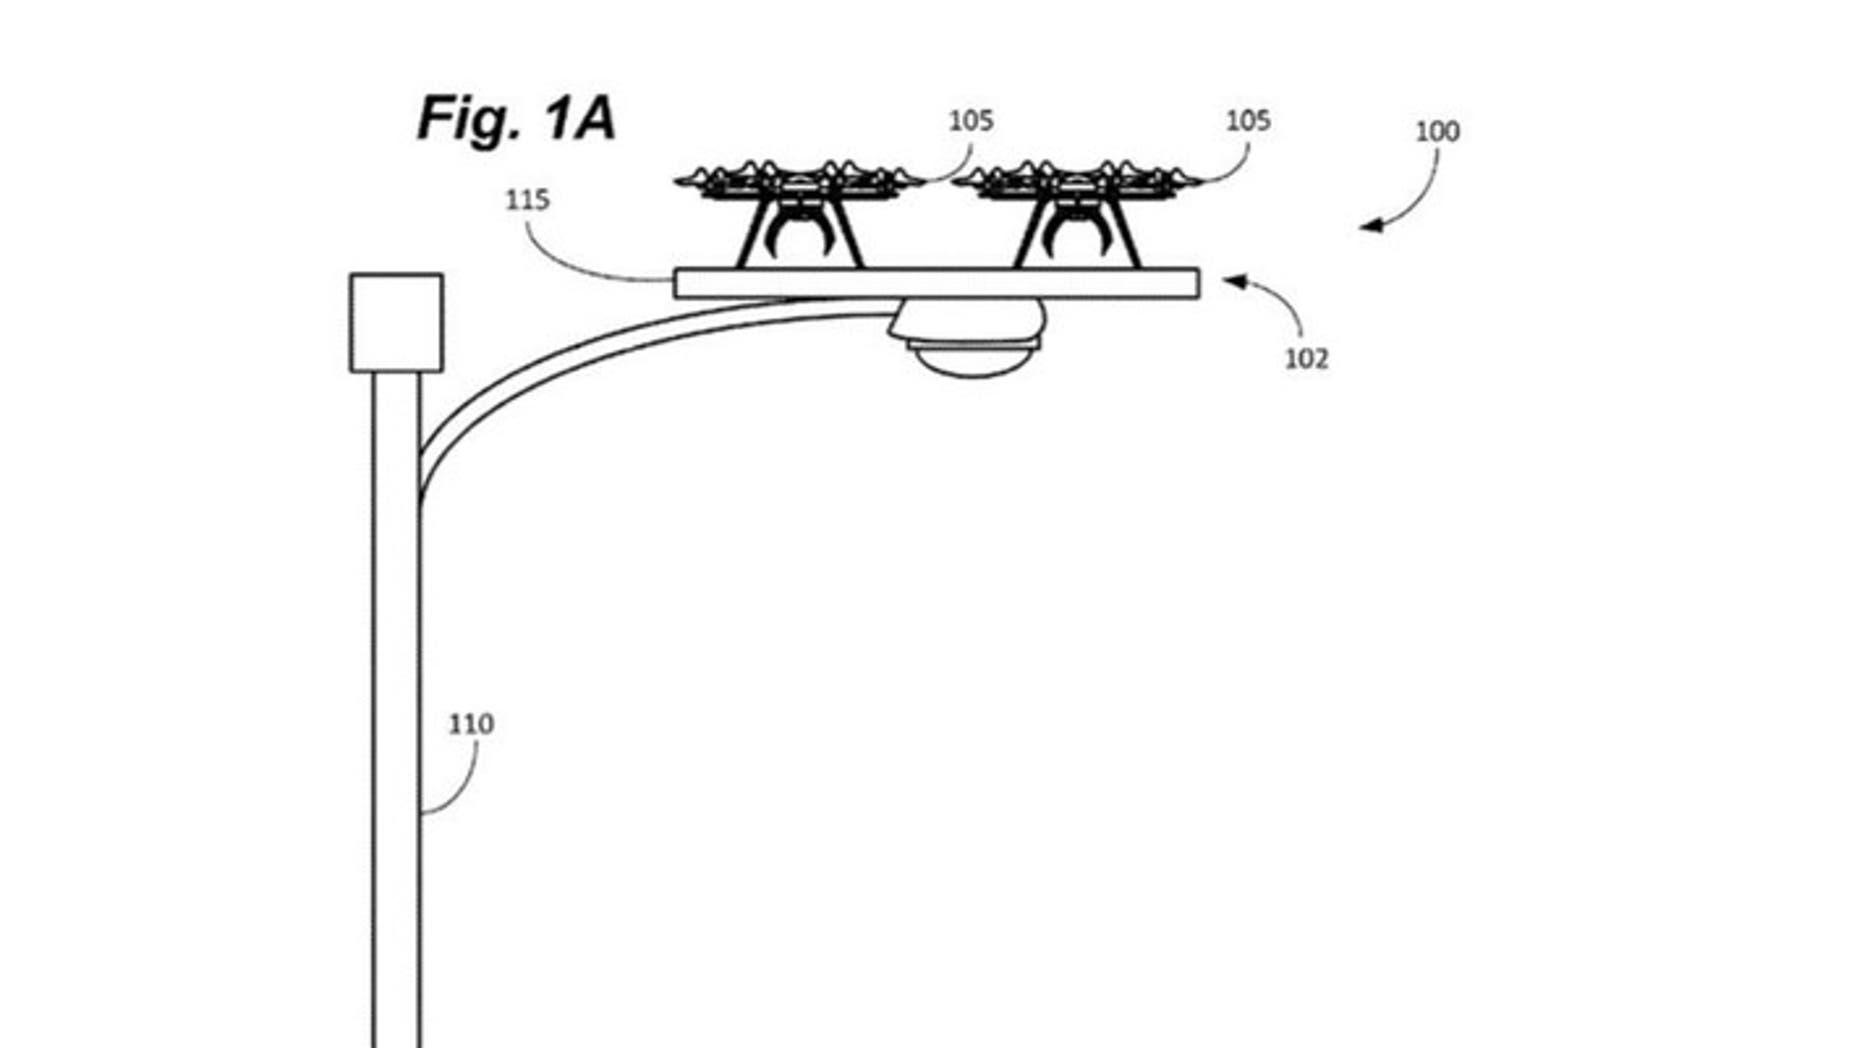 Image from patent (uspto.gov).